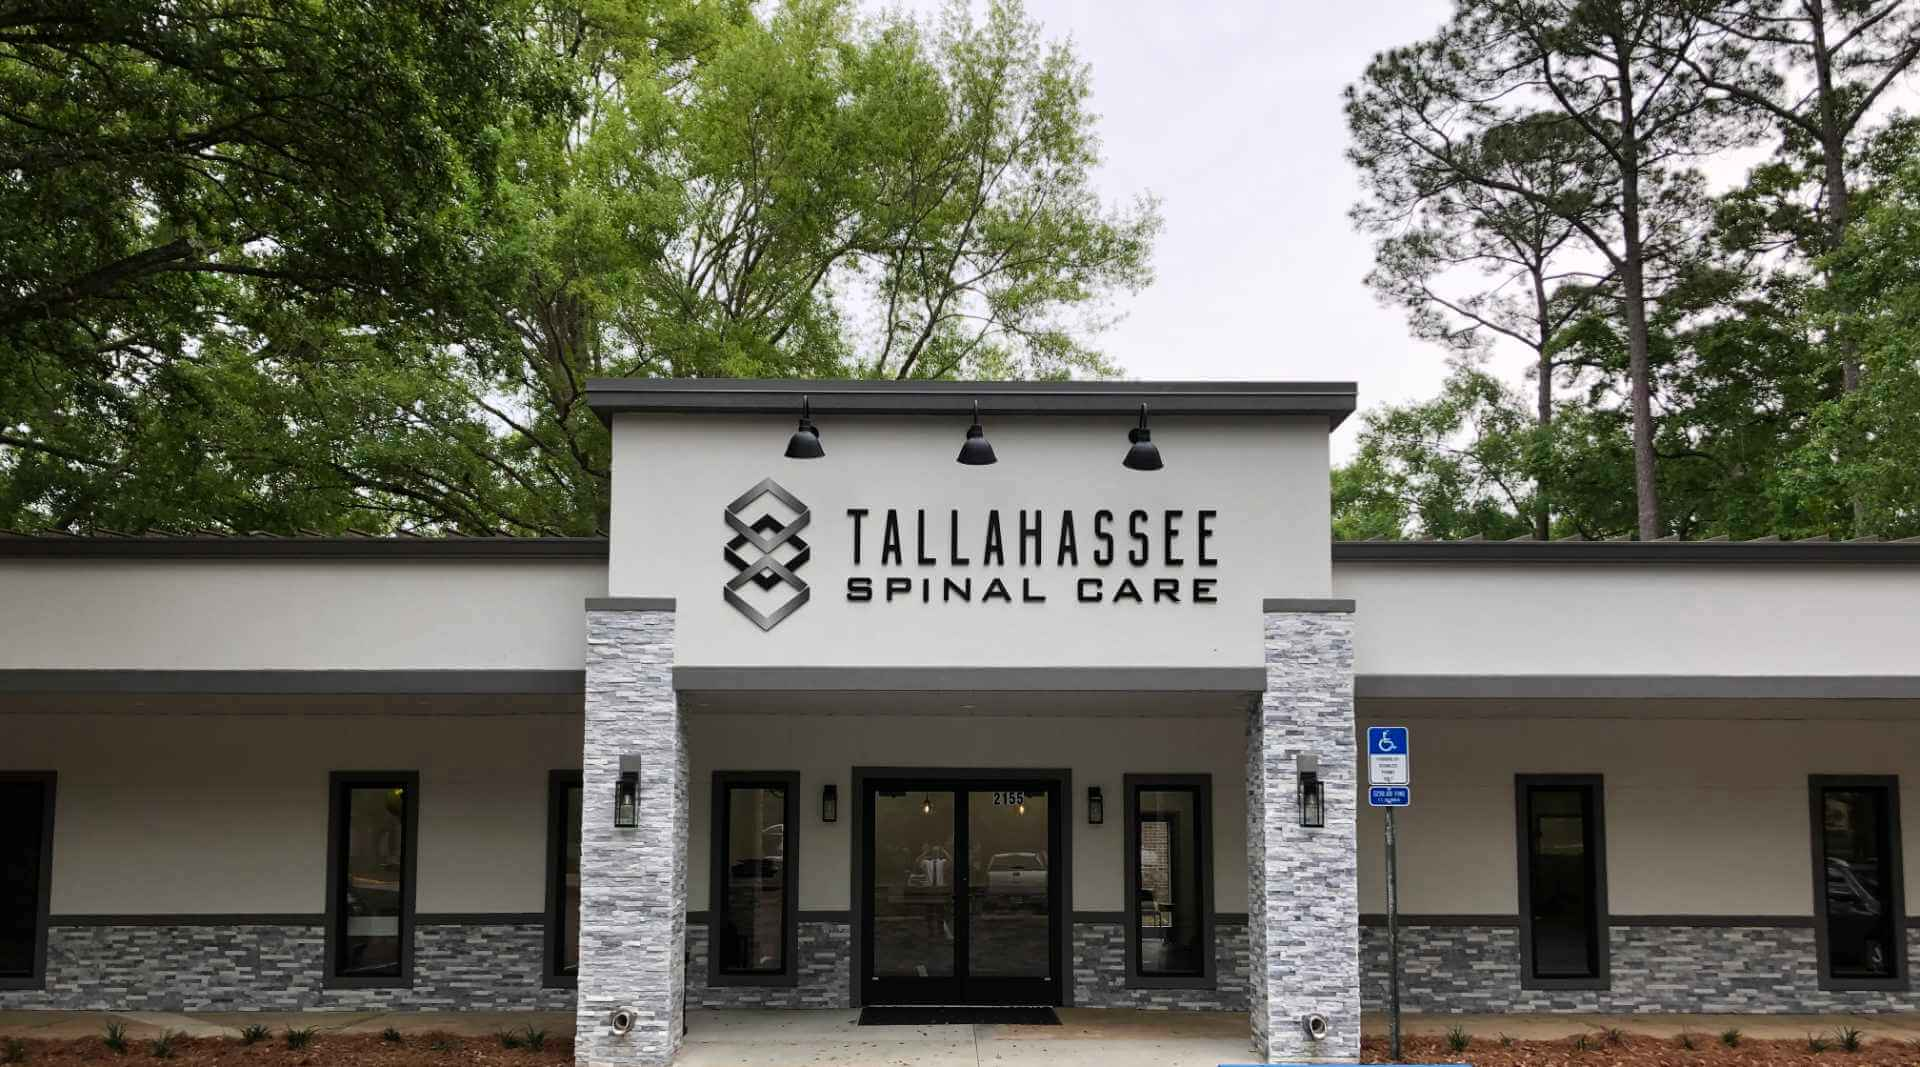 Tallahassee Spinalcare BG